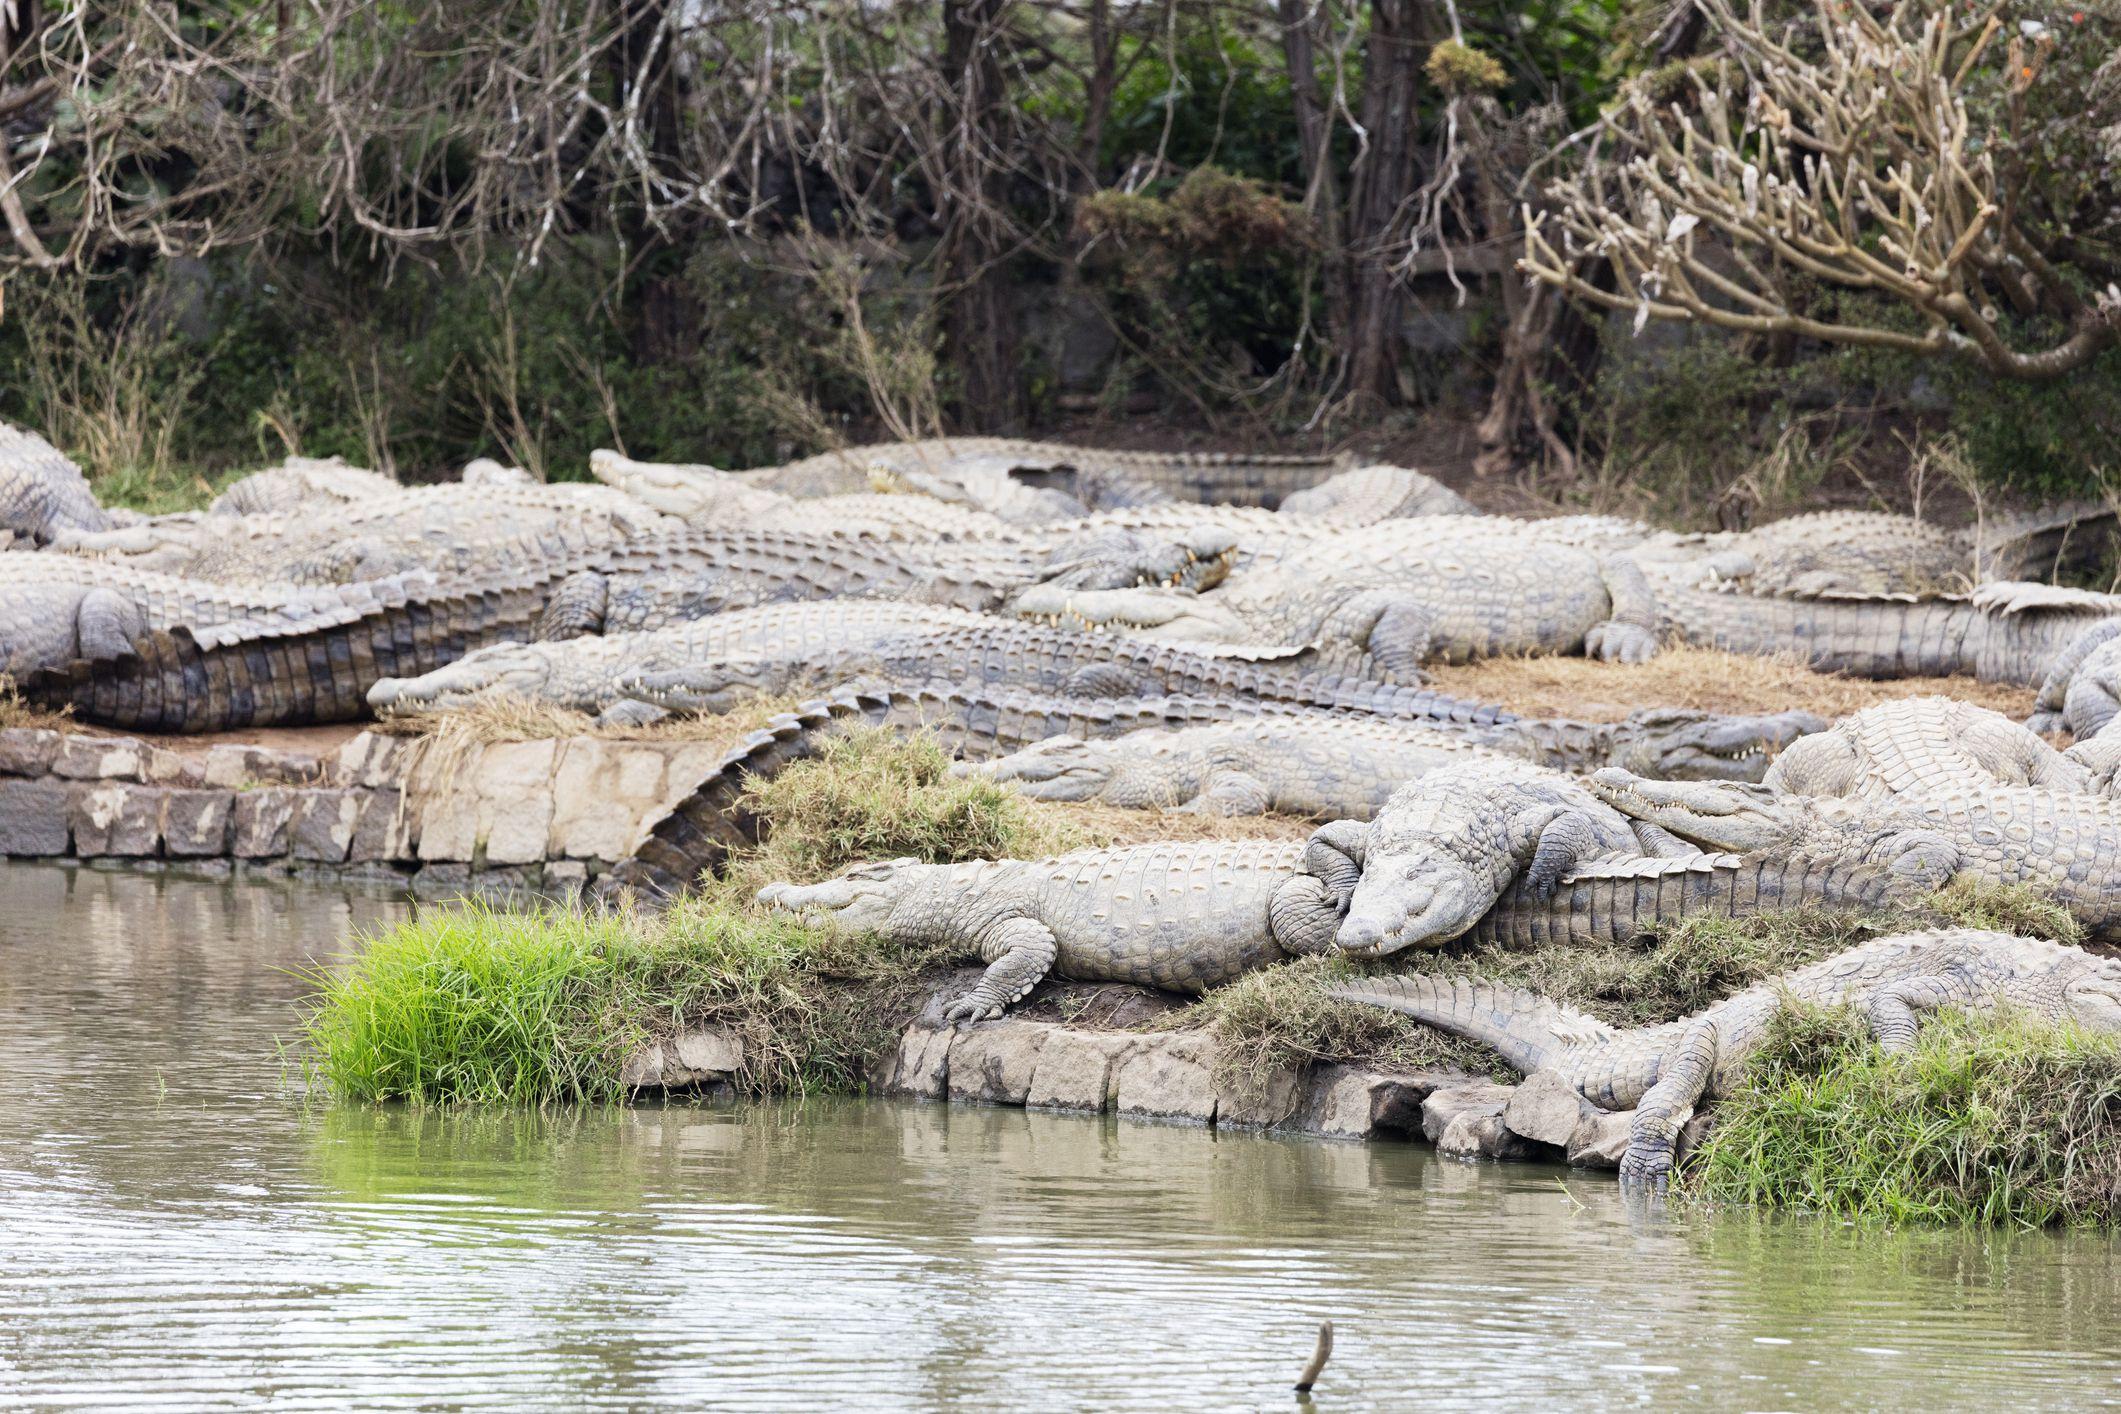 Nile crocodiles at Croc Farm in Antananarivo